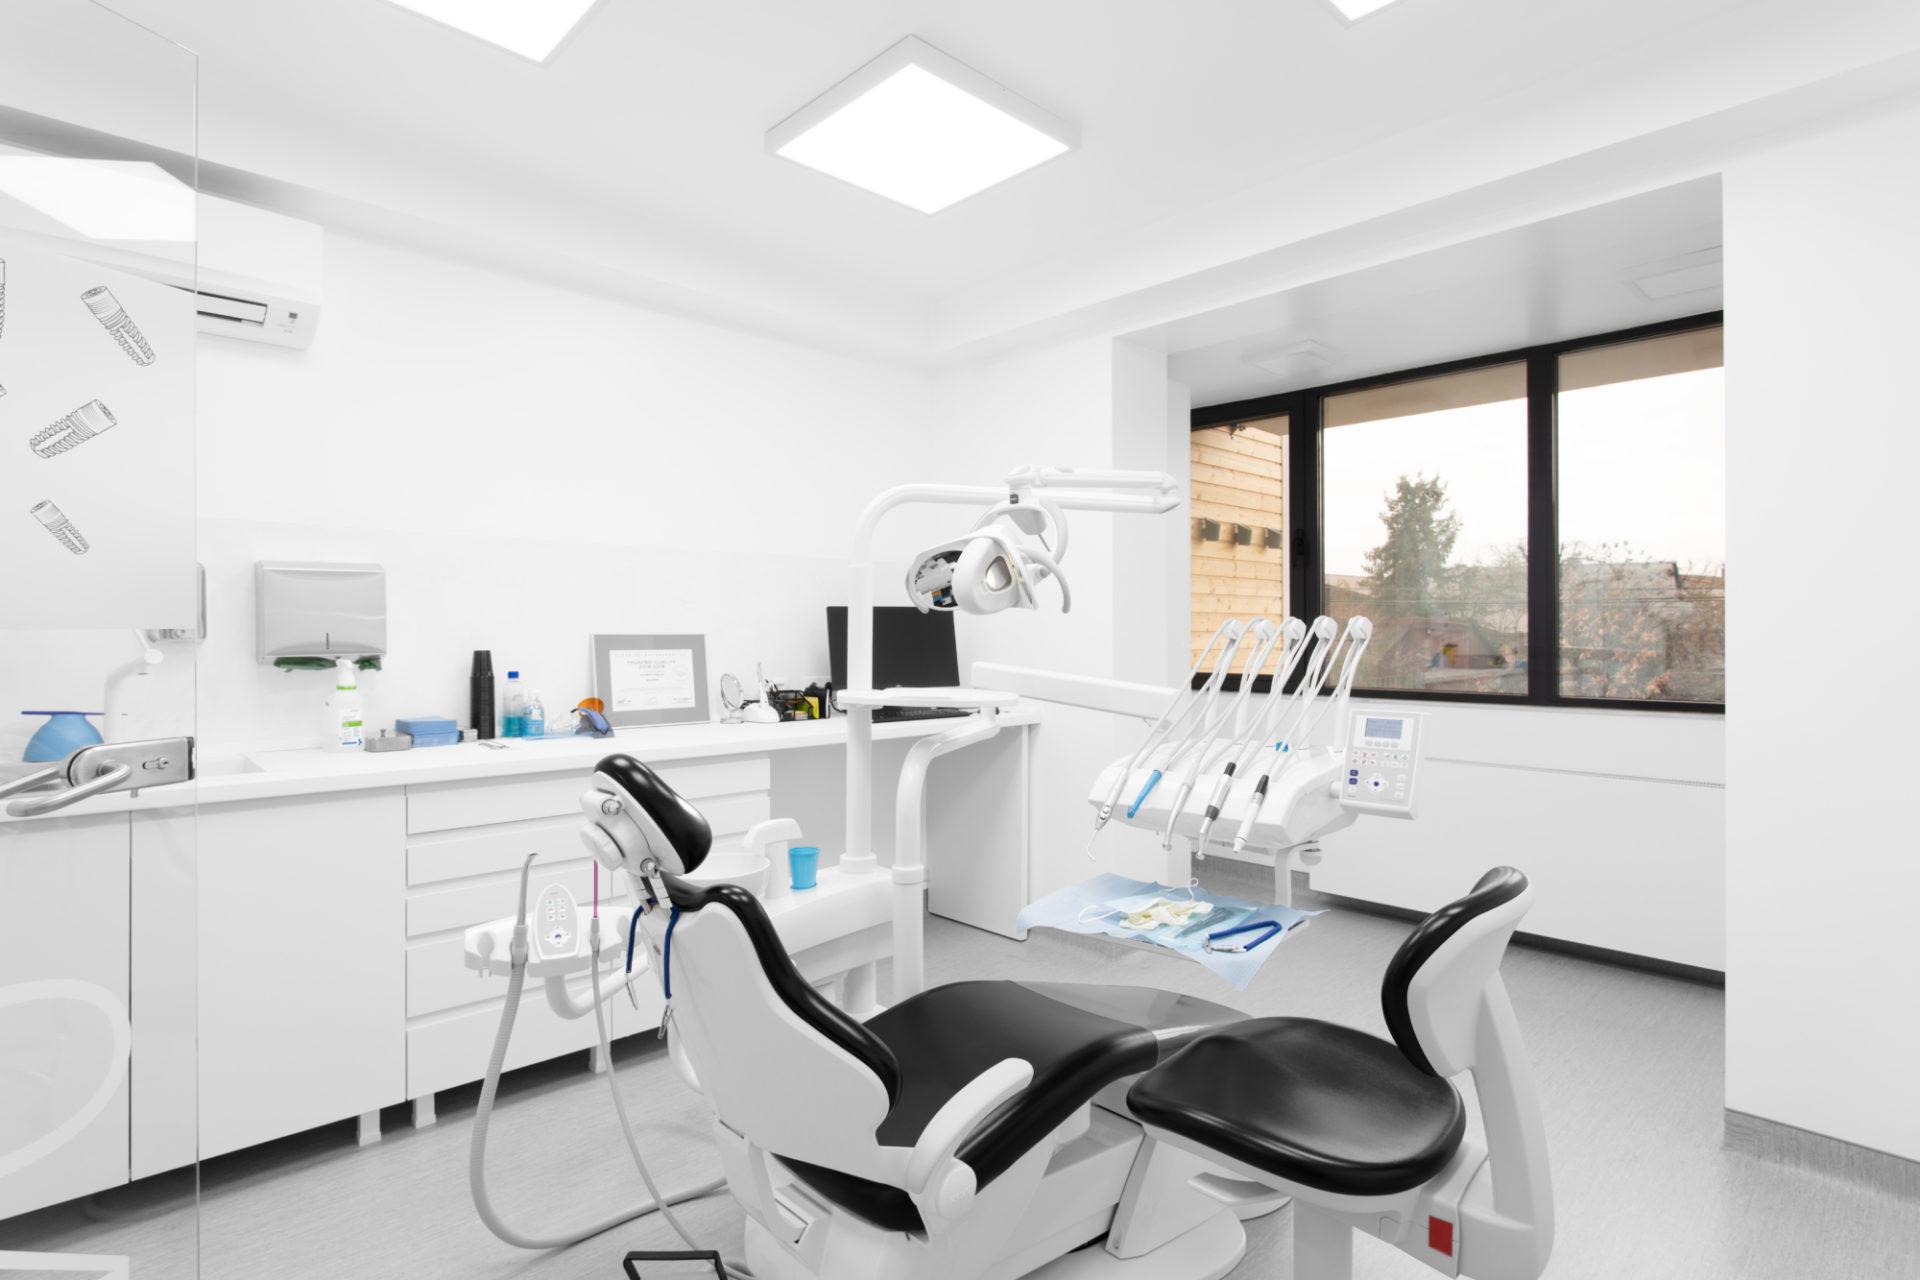 dental clinic interior photoshoot